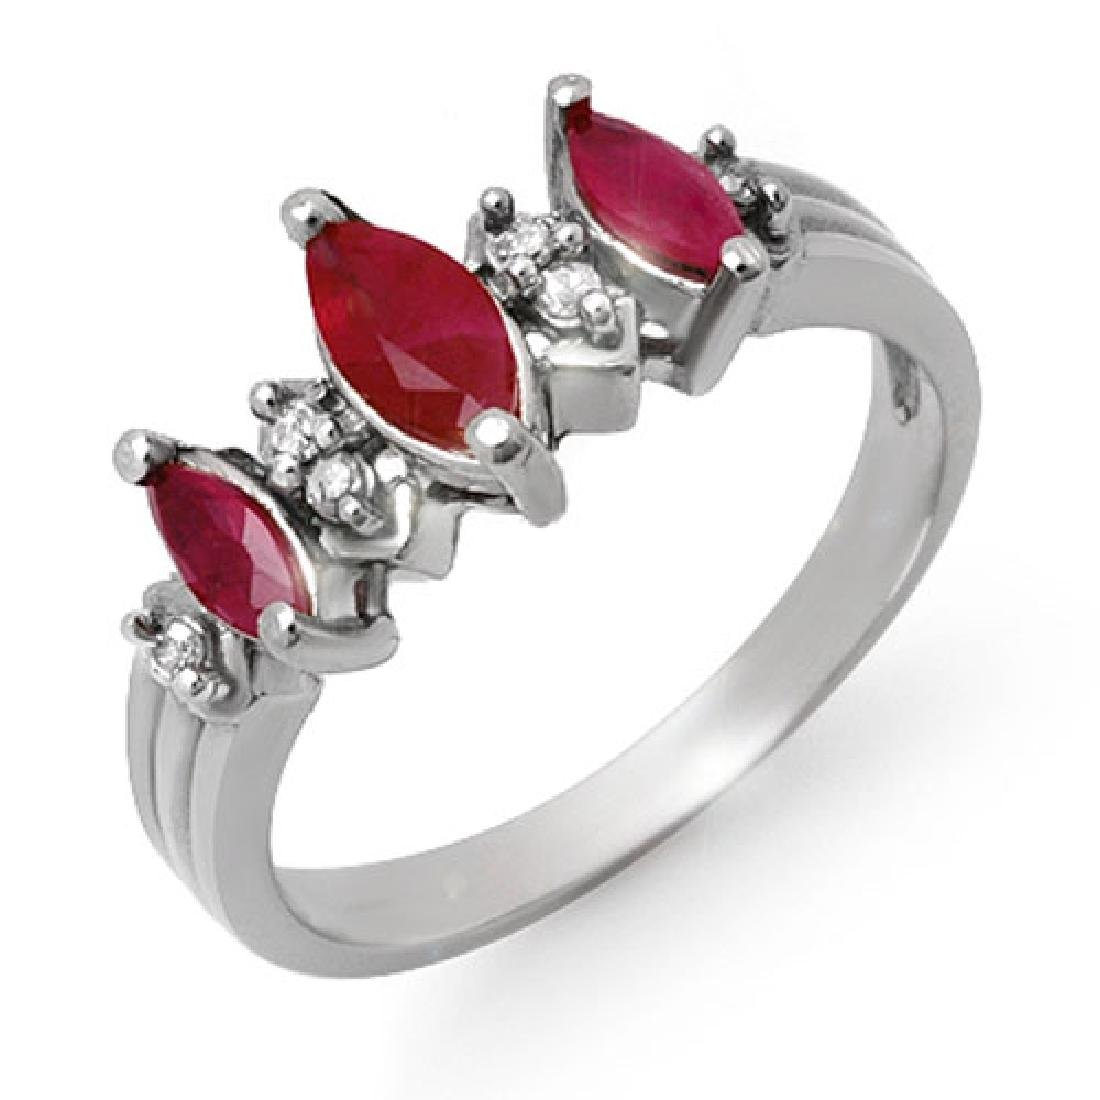 1.0 CTW Ruby & Diamond Ring 10K White Gold